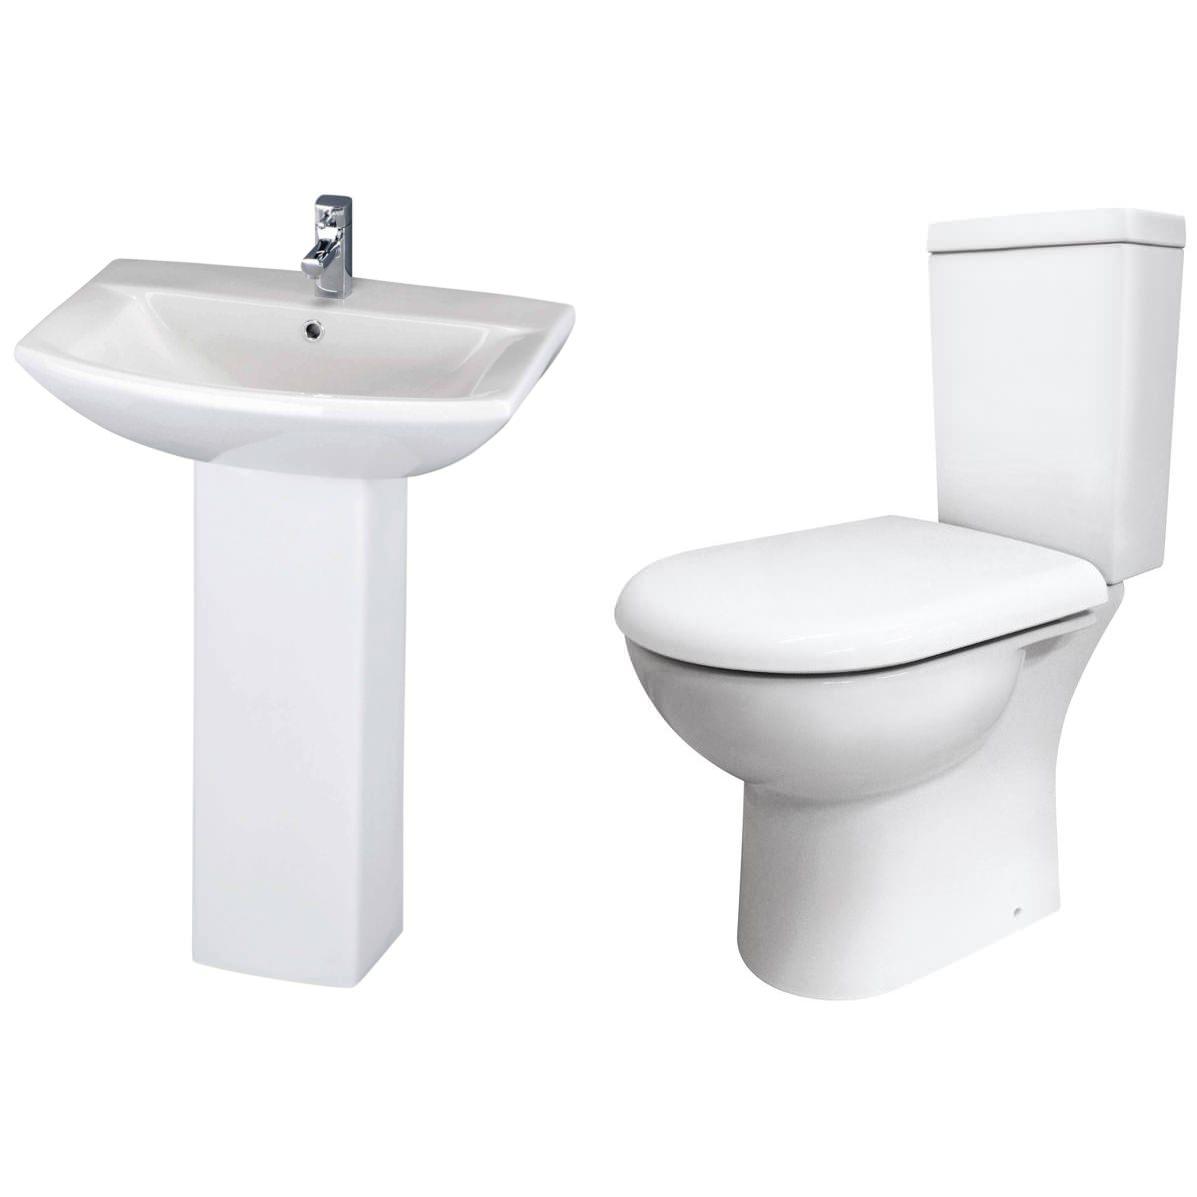 lauren knedlington basin and toilet set ForWashroom Set